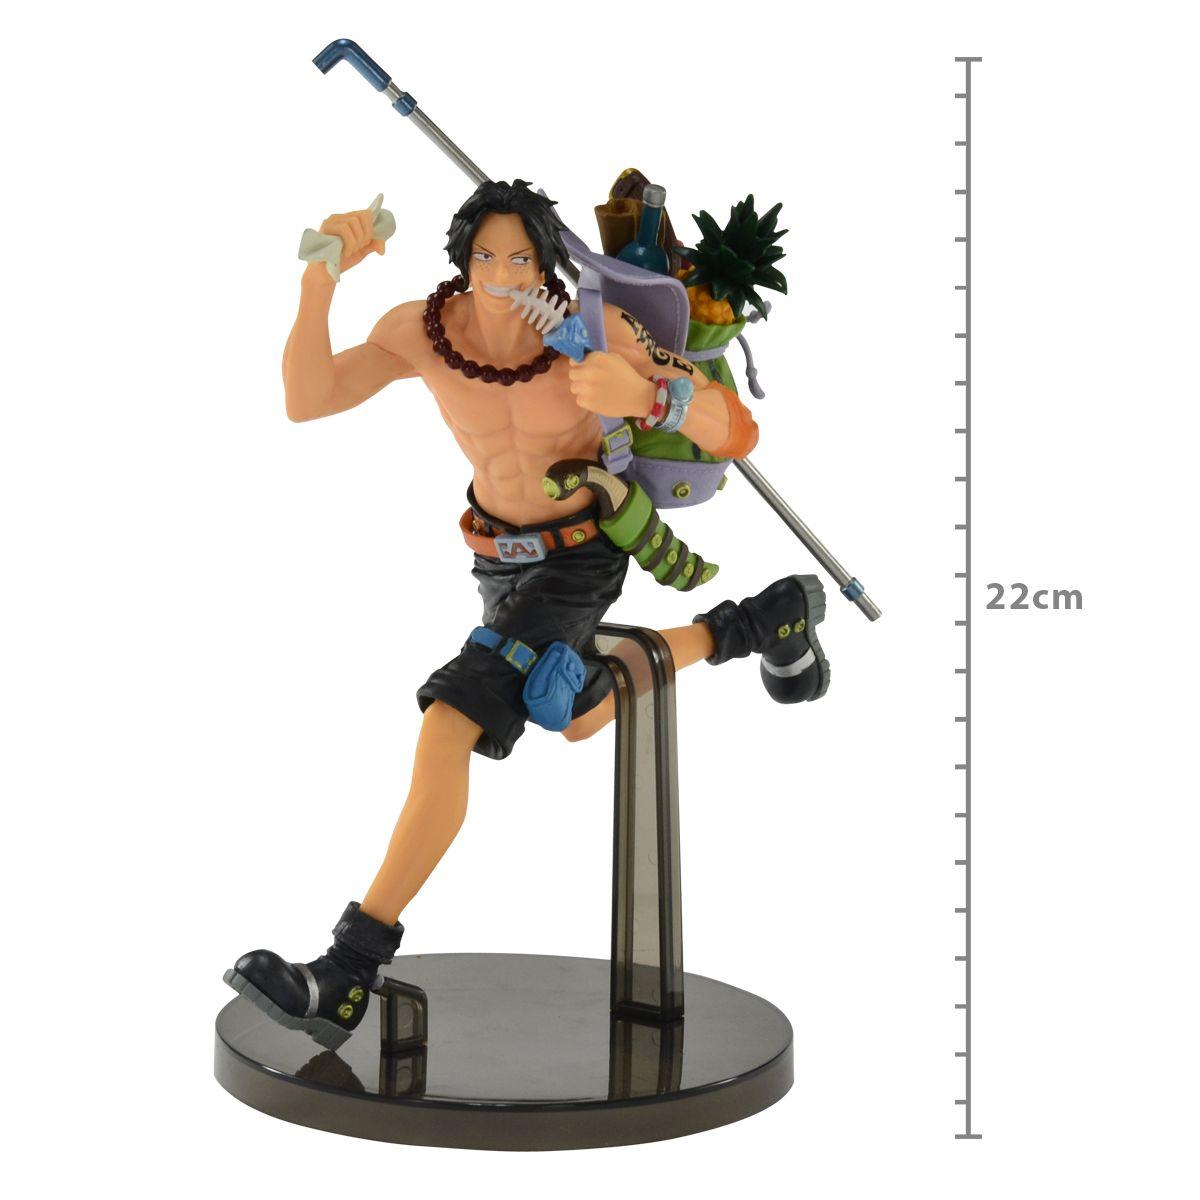 One Piece - Portgas D. Ace - One Piece Mania Produce - Bandai Banpresto